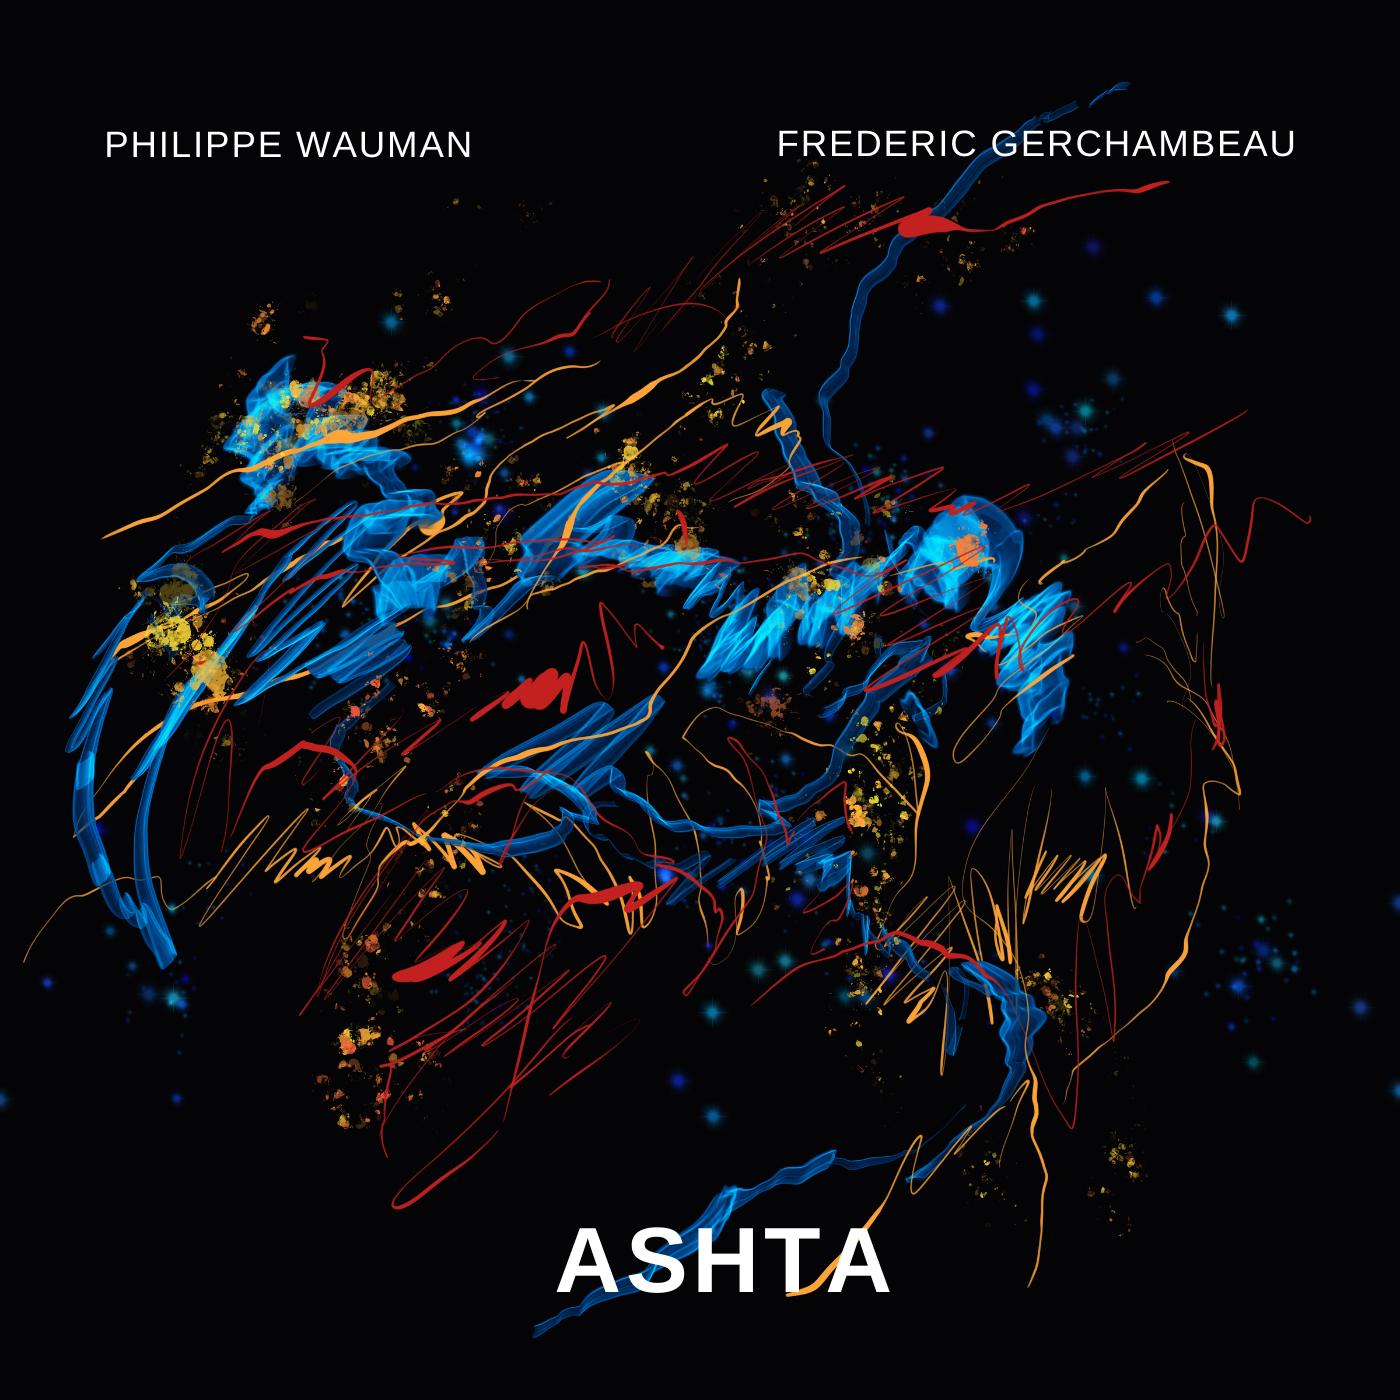 Ashta electronic music album